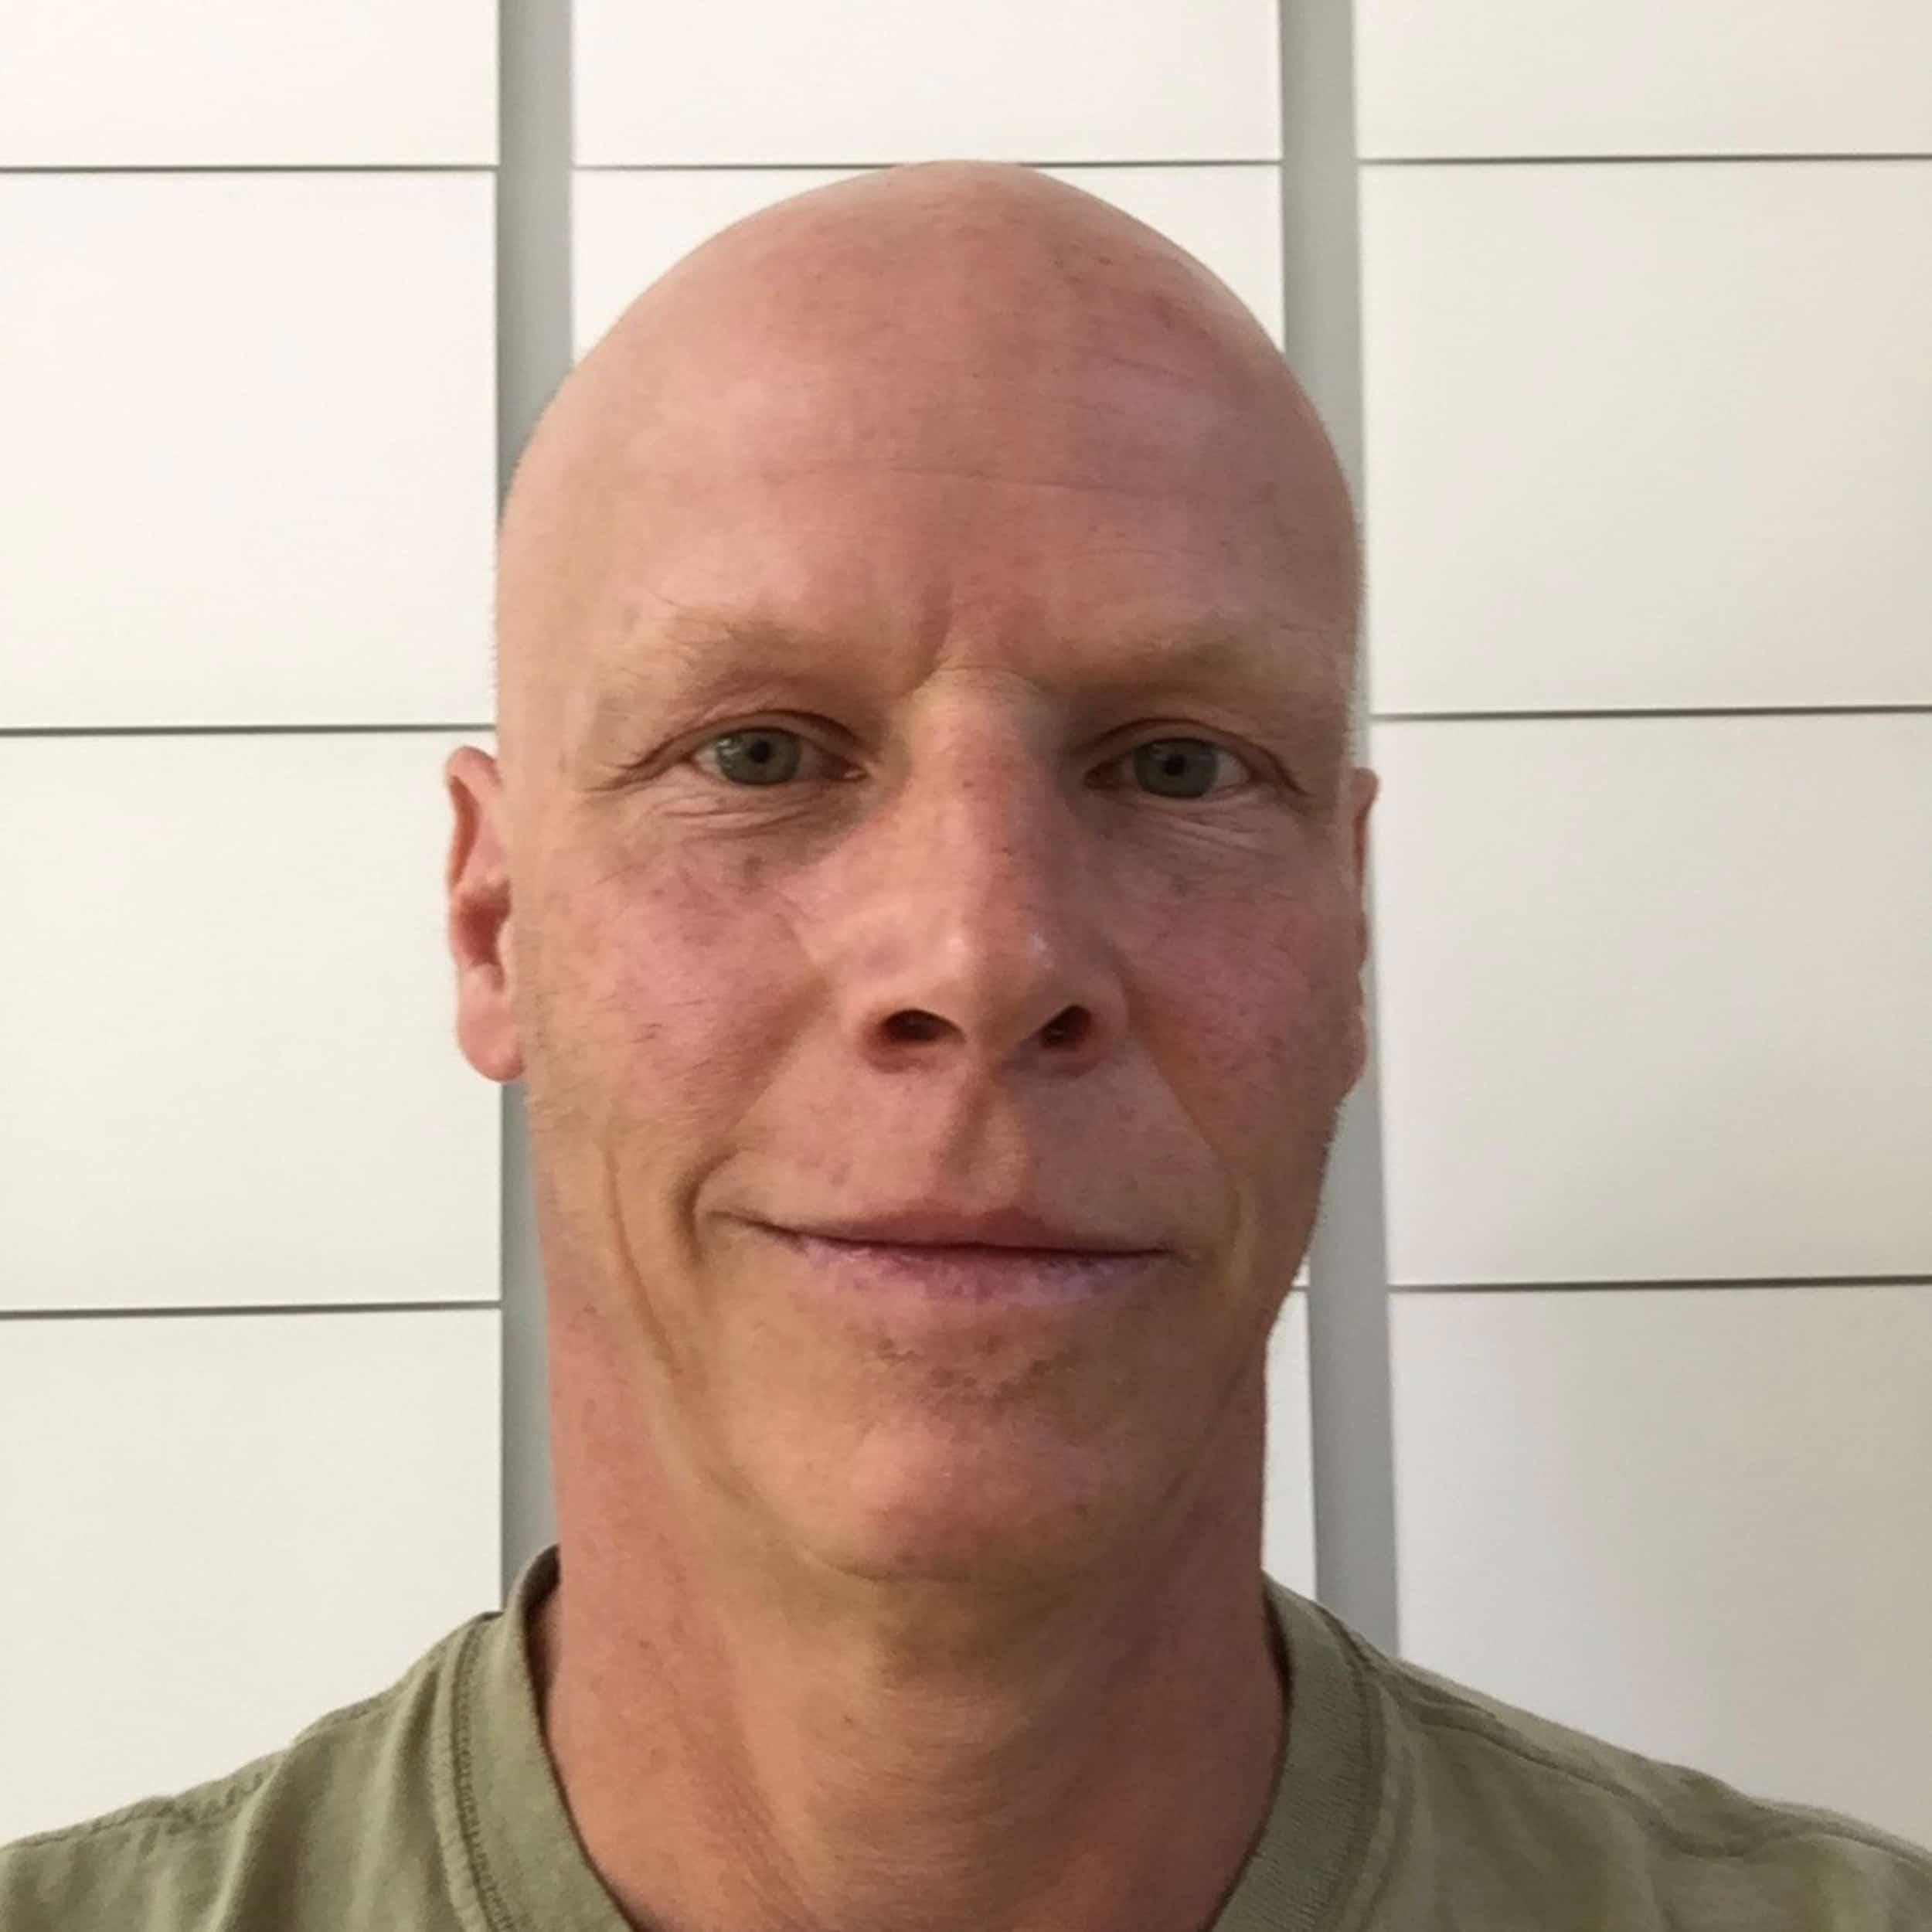 Bald man in green T shirt looking at camer